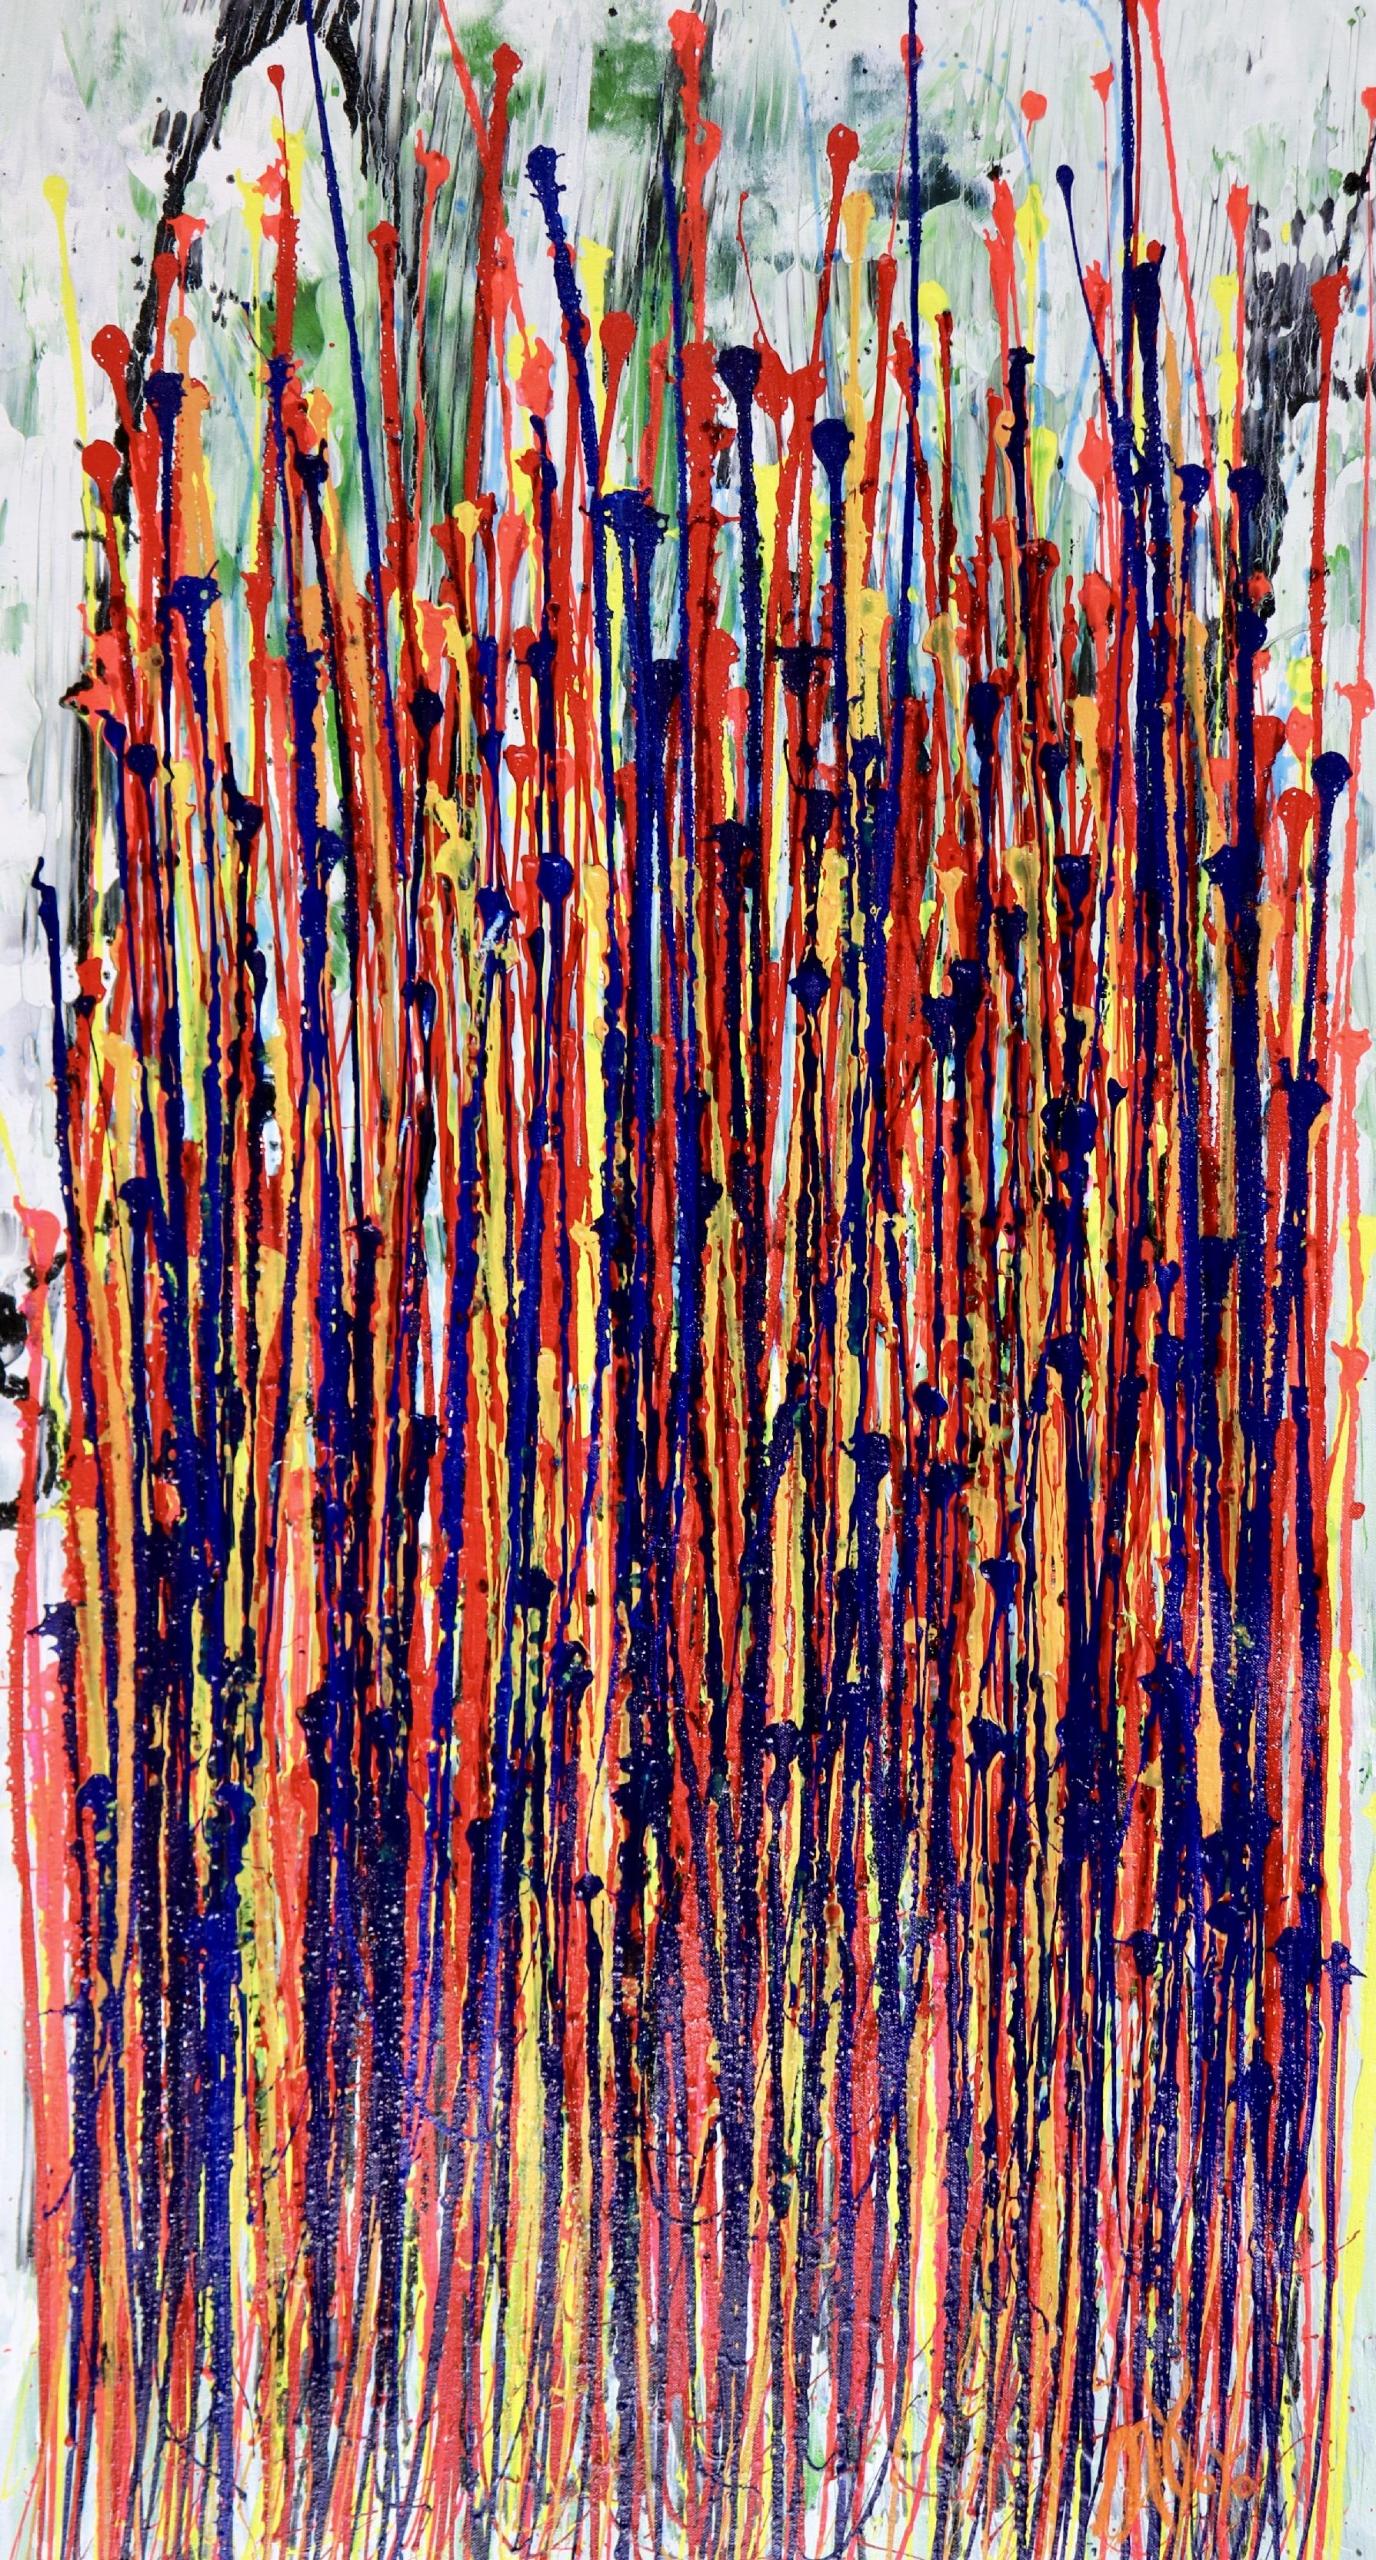 Illuminating Garden Spectra 3 (2020) Abstract painting by Nestor Toro